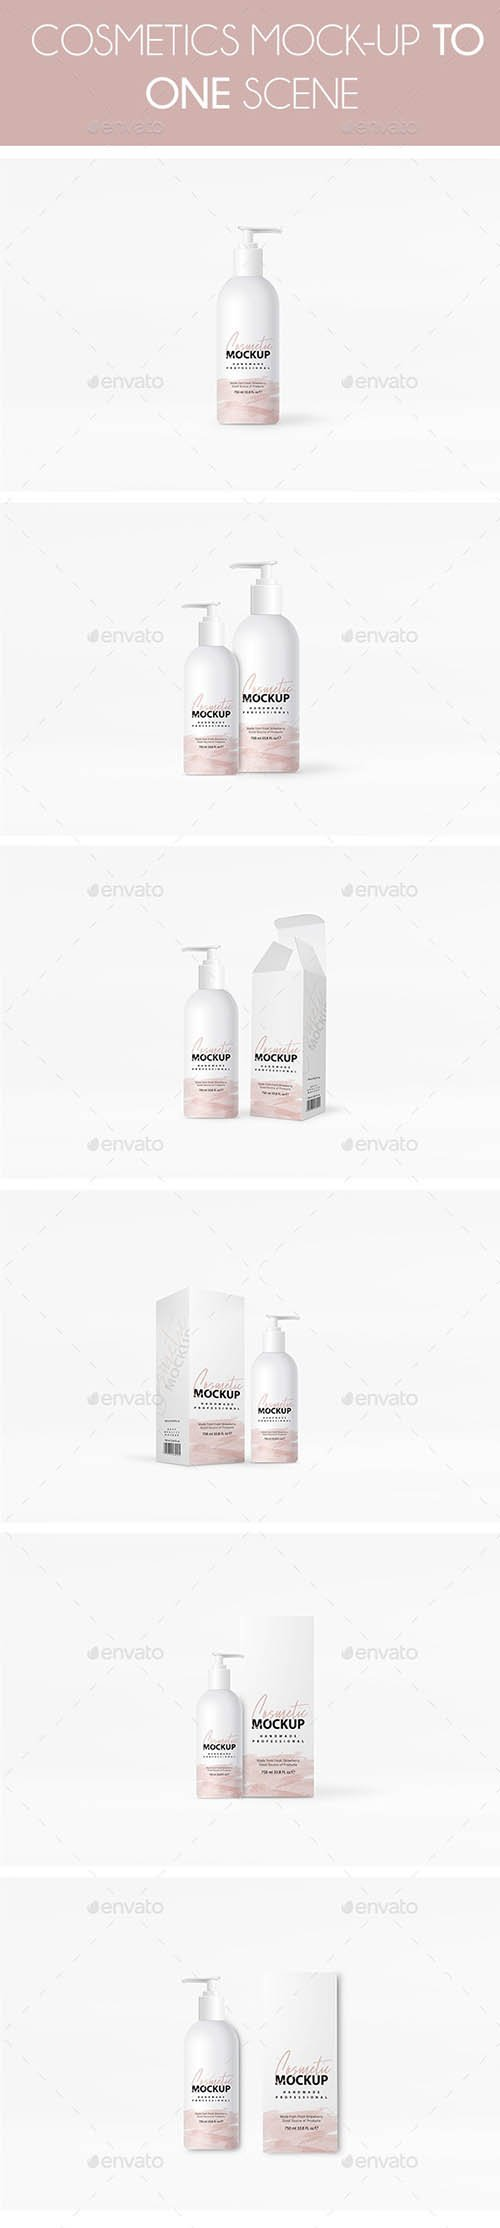 GraphicRiver - Cosmetics Mockup 24268324